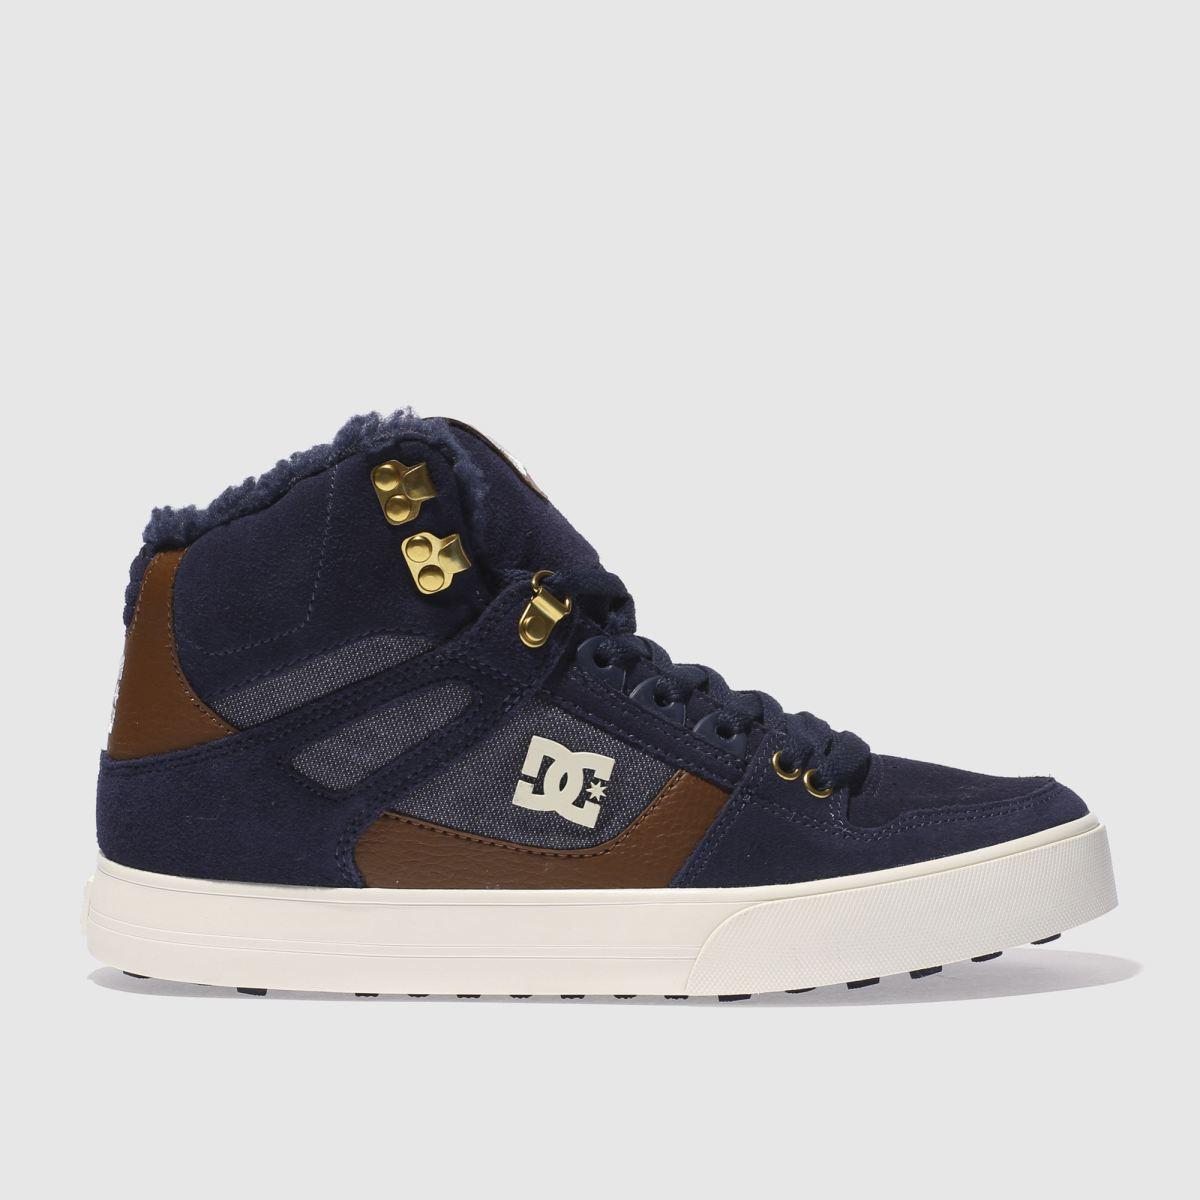 dc shoes Dc Shoes Navy Spartan Hi Wc Wnt Trainers